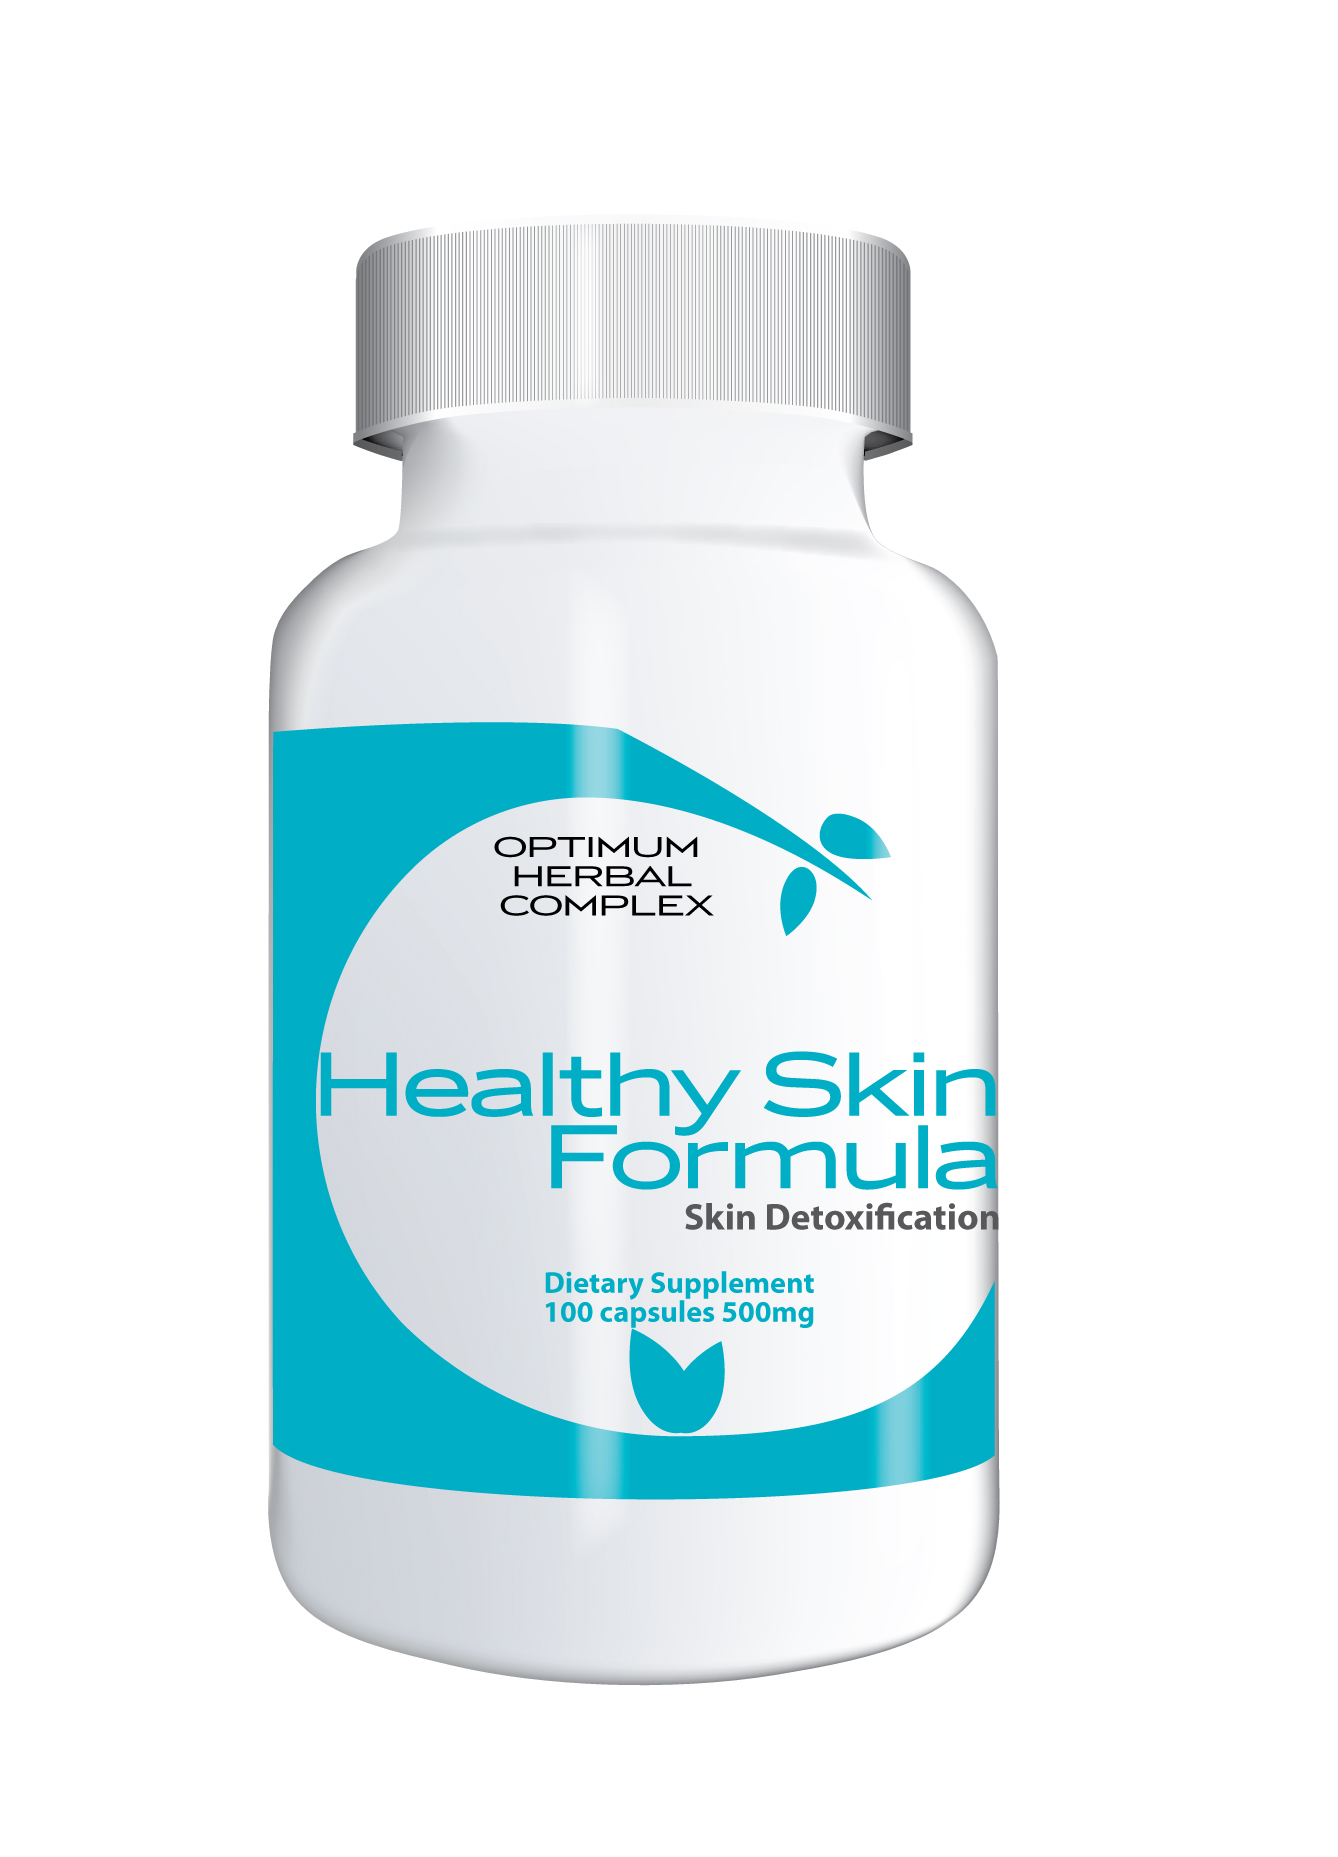 Healthy Skin Formula 100 capsules 500mg